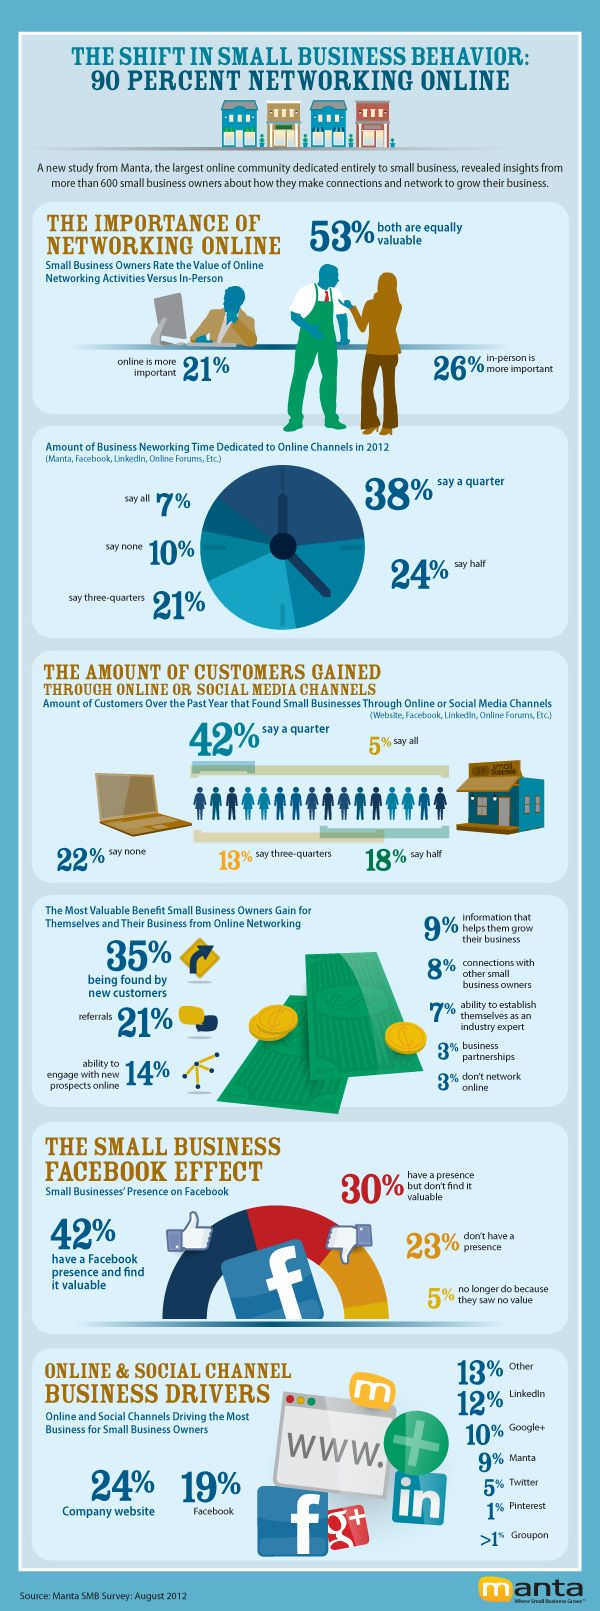 90 Percent of Small Business in USA Use Social MediaSocial Network,  Internet Site, Social Marketing,  Website, Social Media, Small Businesses, Network Online, Infographic, Socialmedia